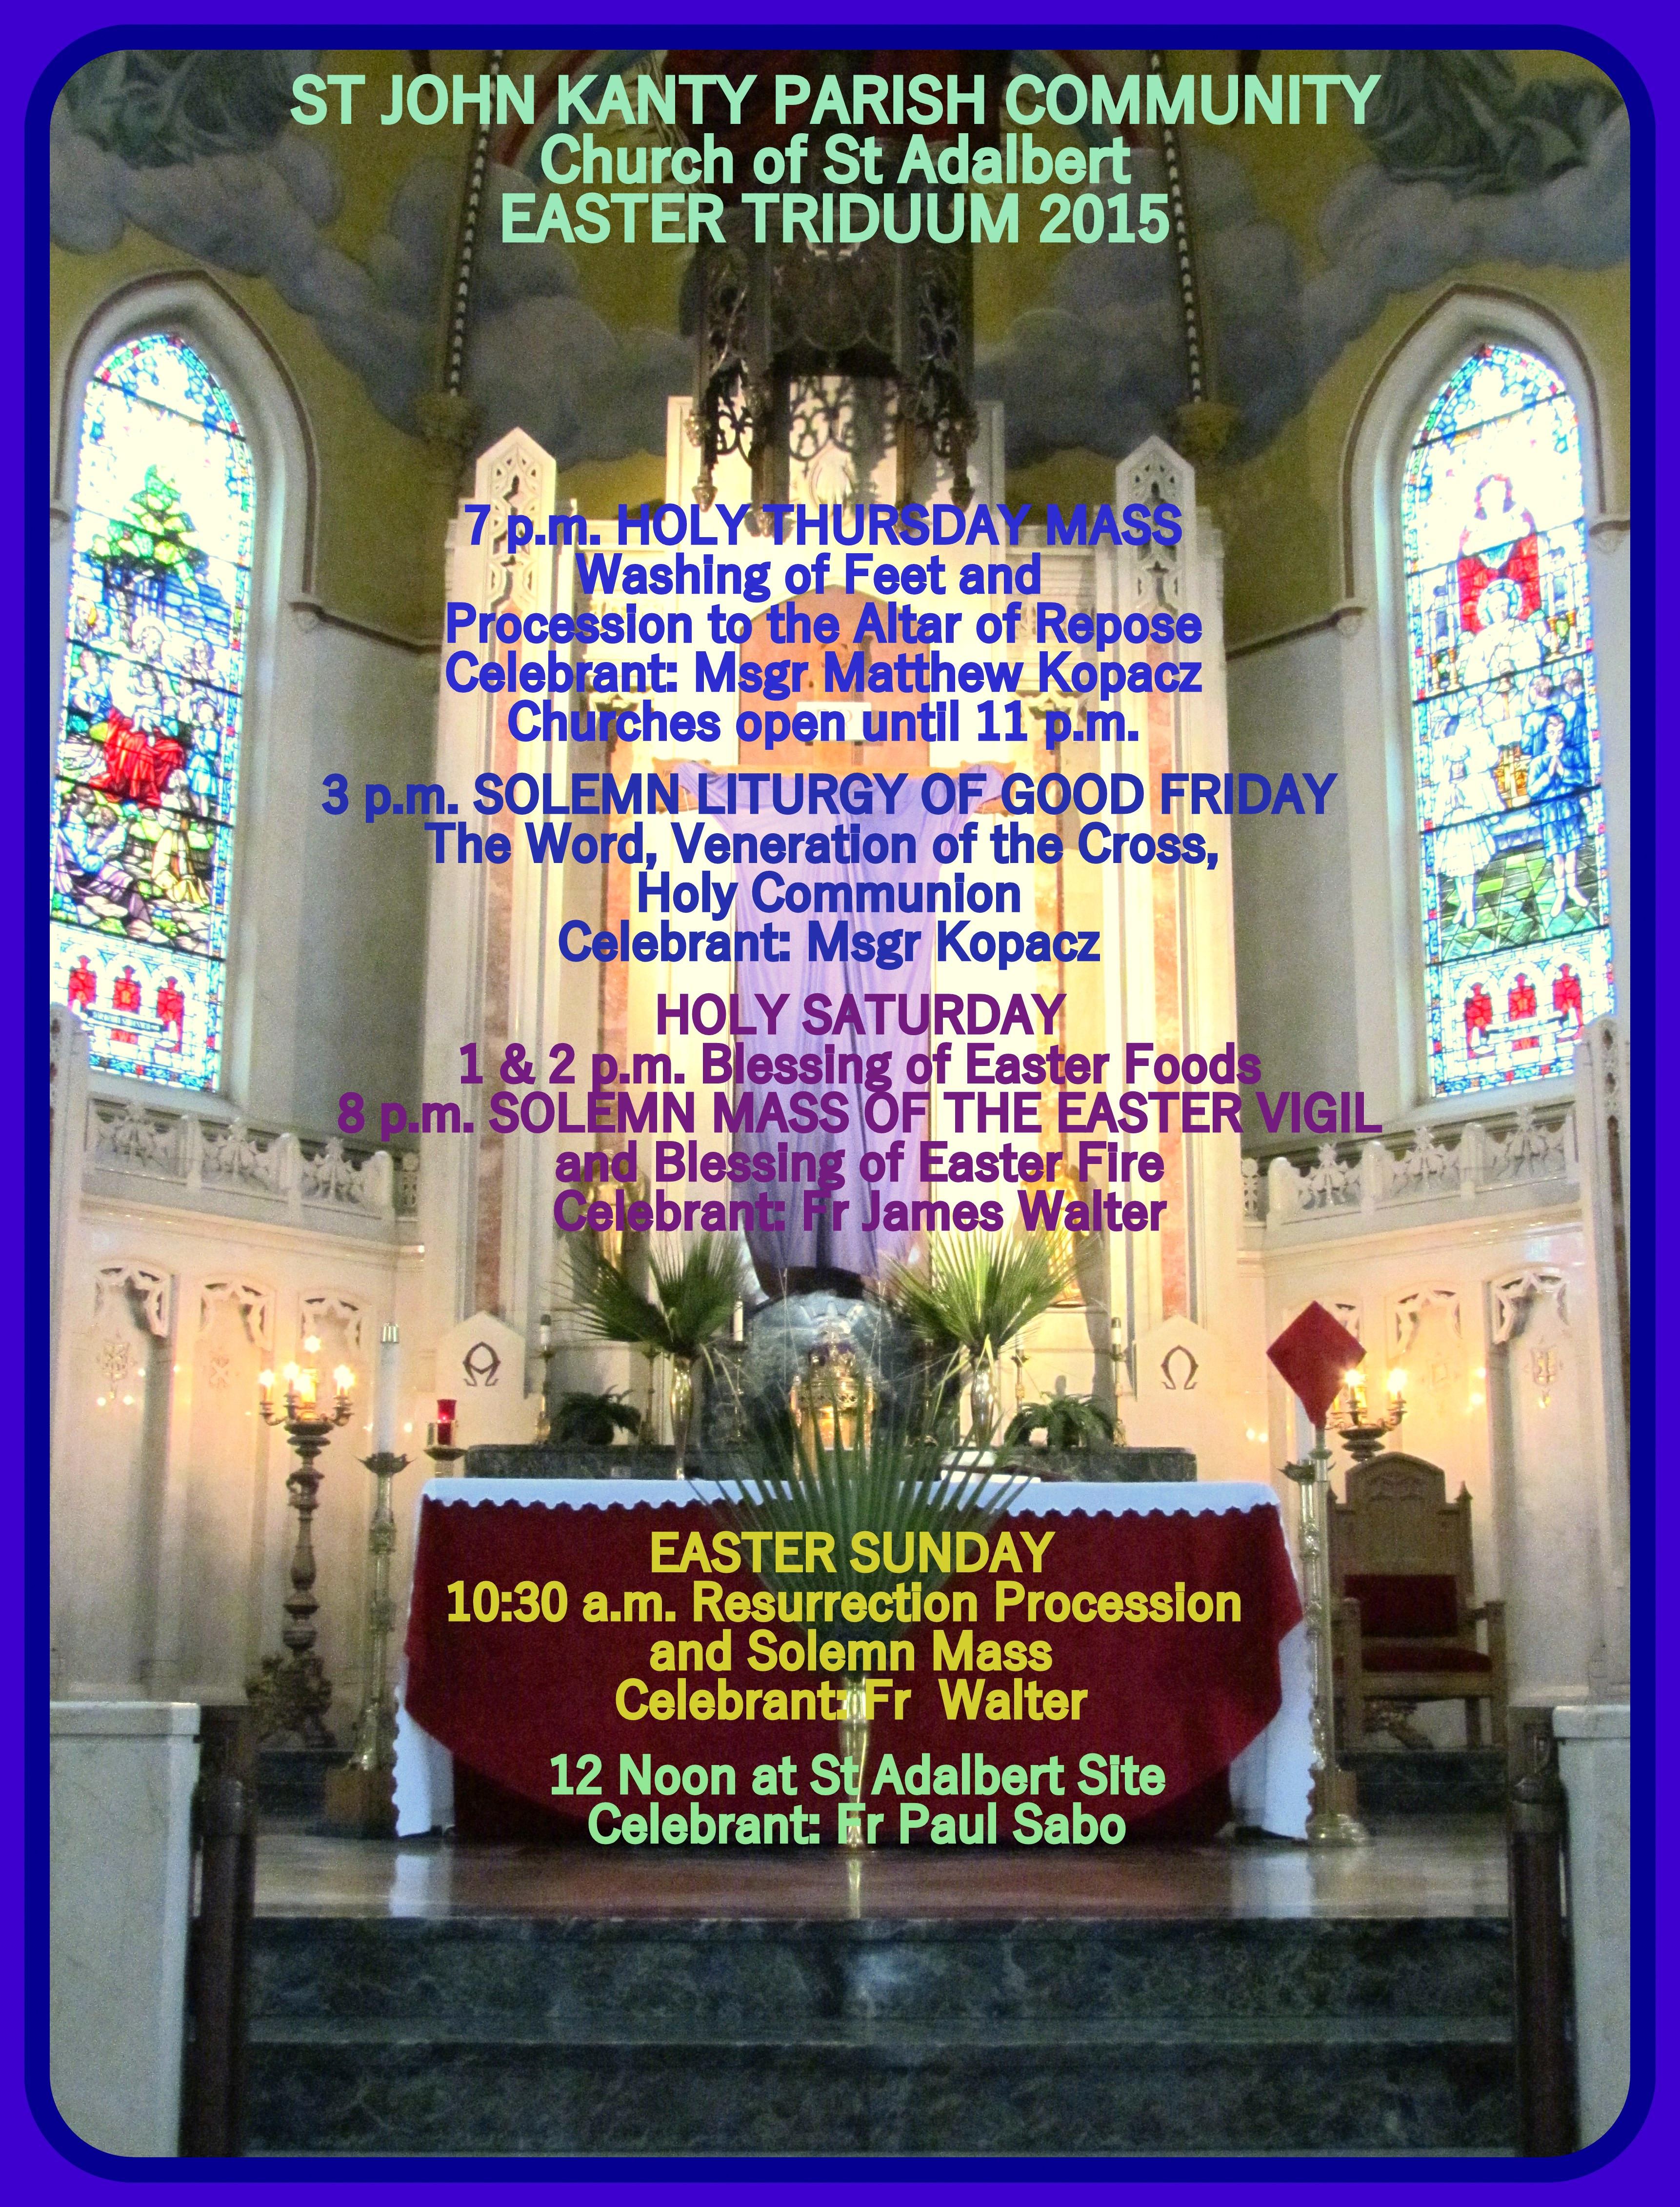 Easter Dinner Buffalo Ny  EASTER TRIDUUM AT ST JOHN KANTY PARISH CHURCH OF ST